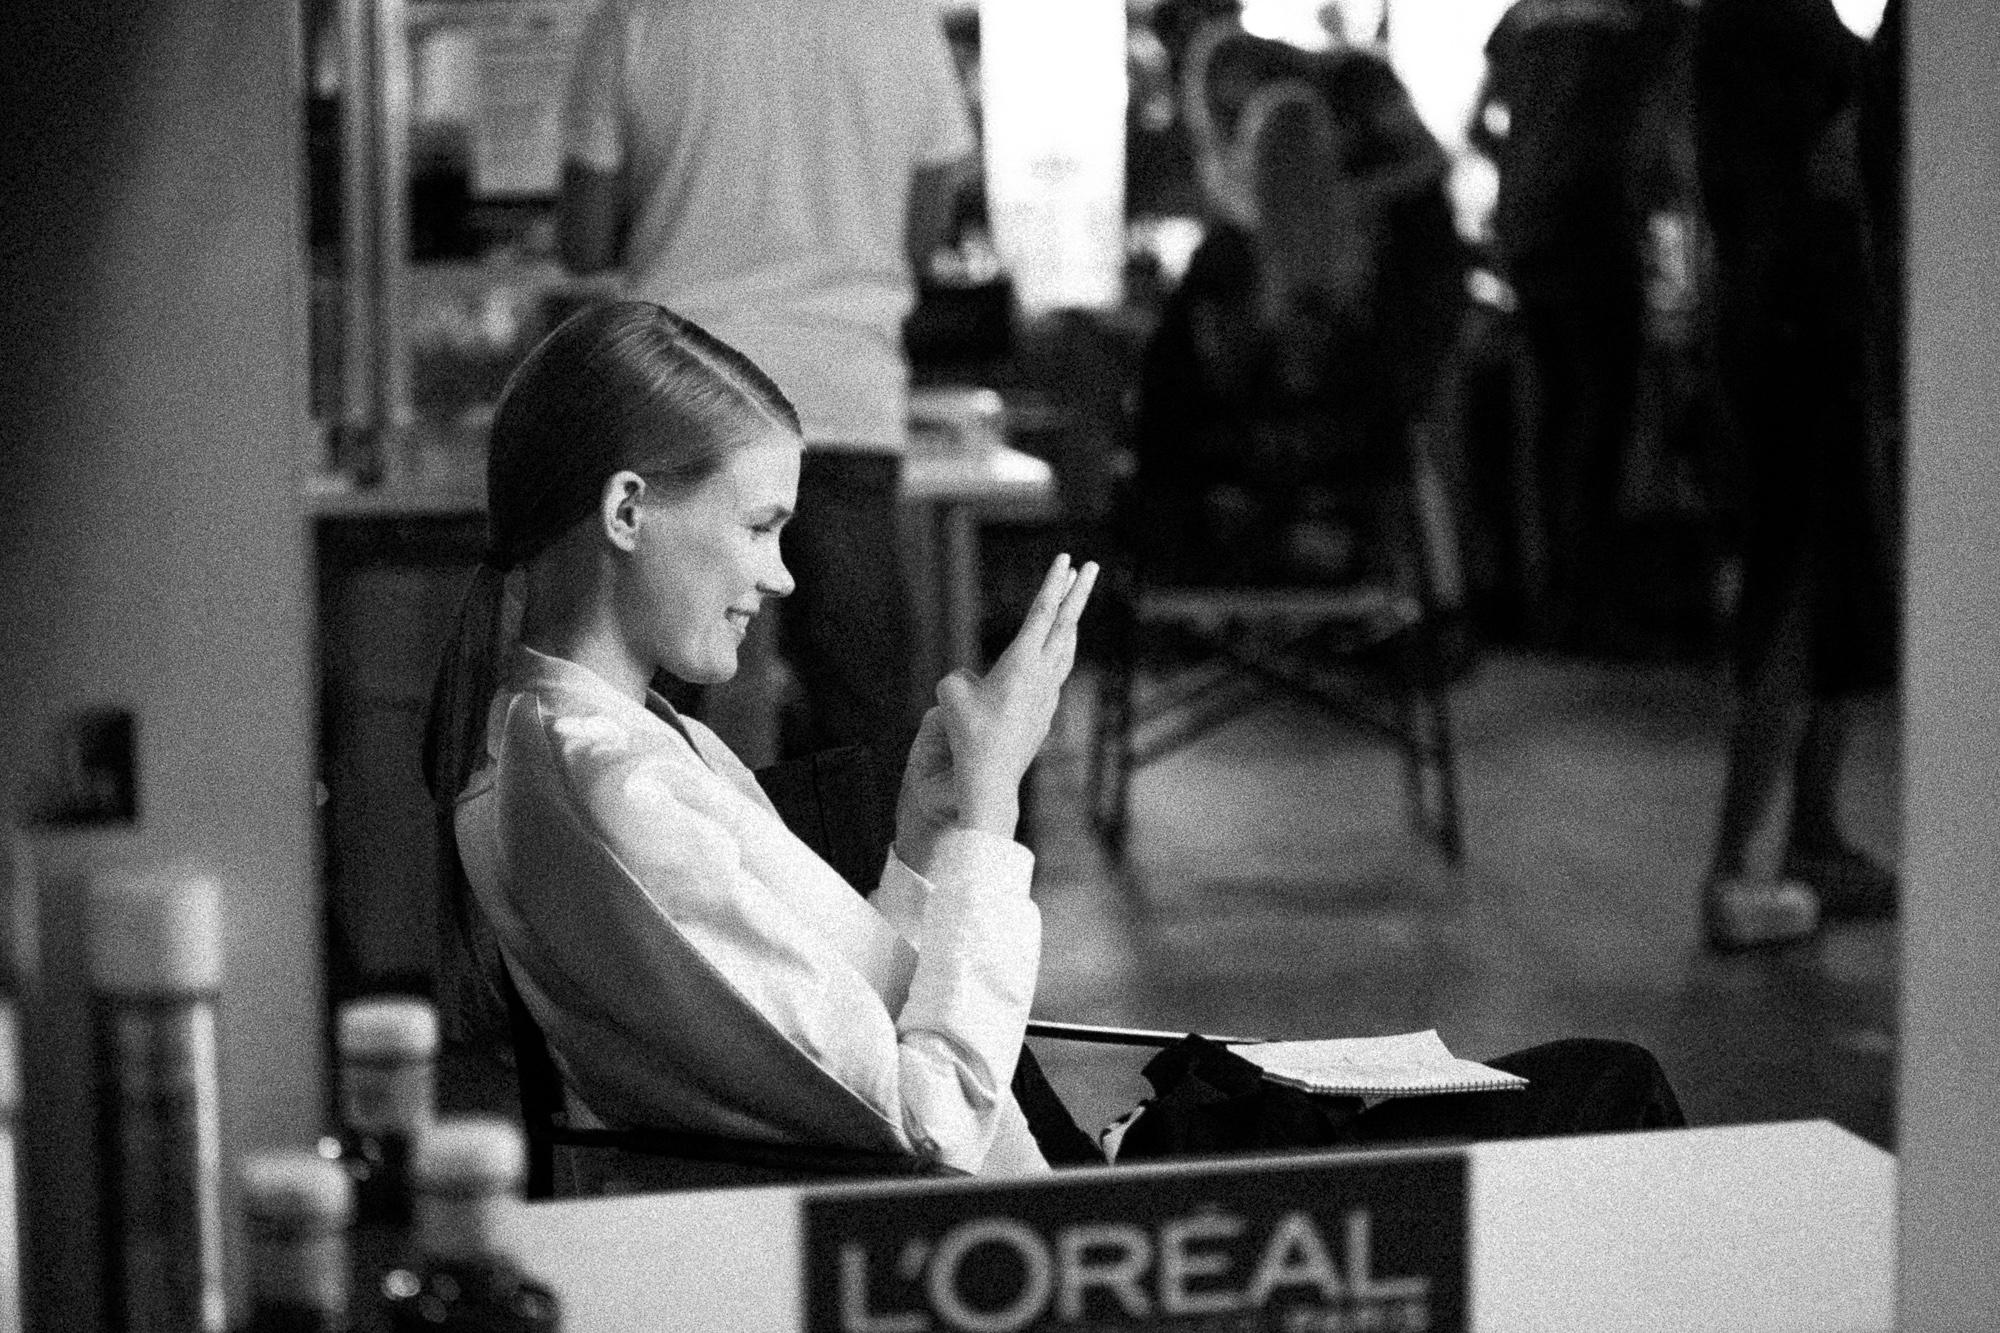 oscar-arribas-beauty-backstage-madrid-fashion-week-cibeles-photography-moda-desfile-fotografo-photographer-portrait-retrato-41__MG_5198.jpg